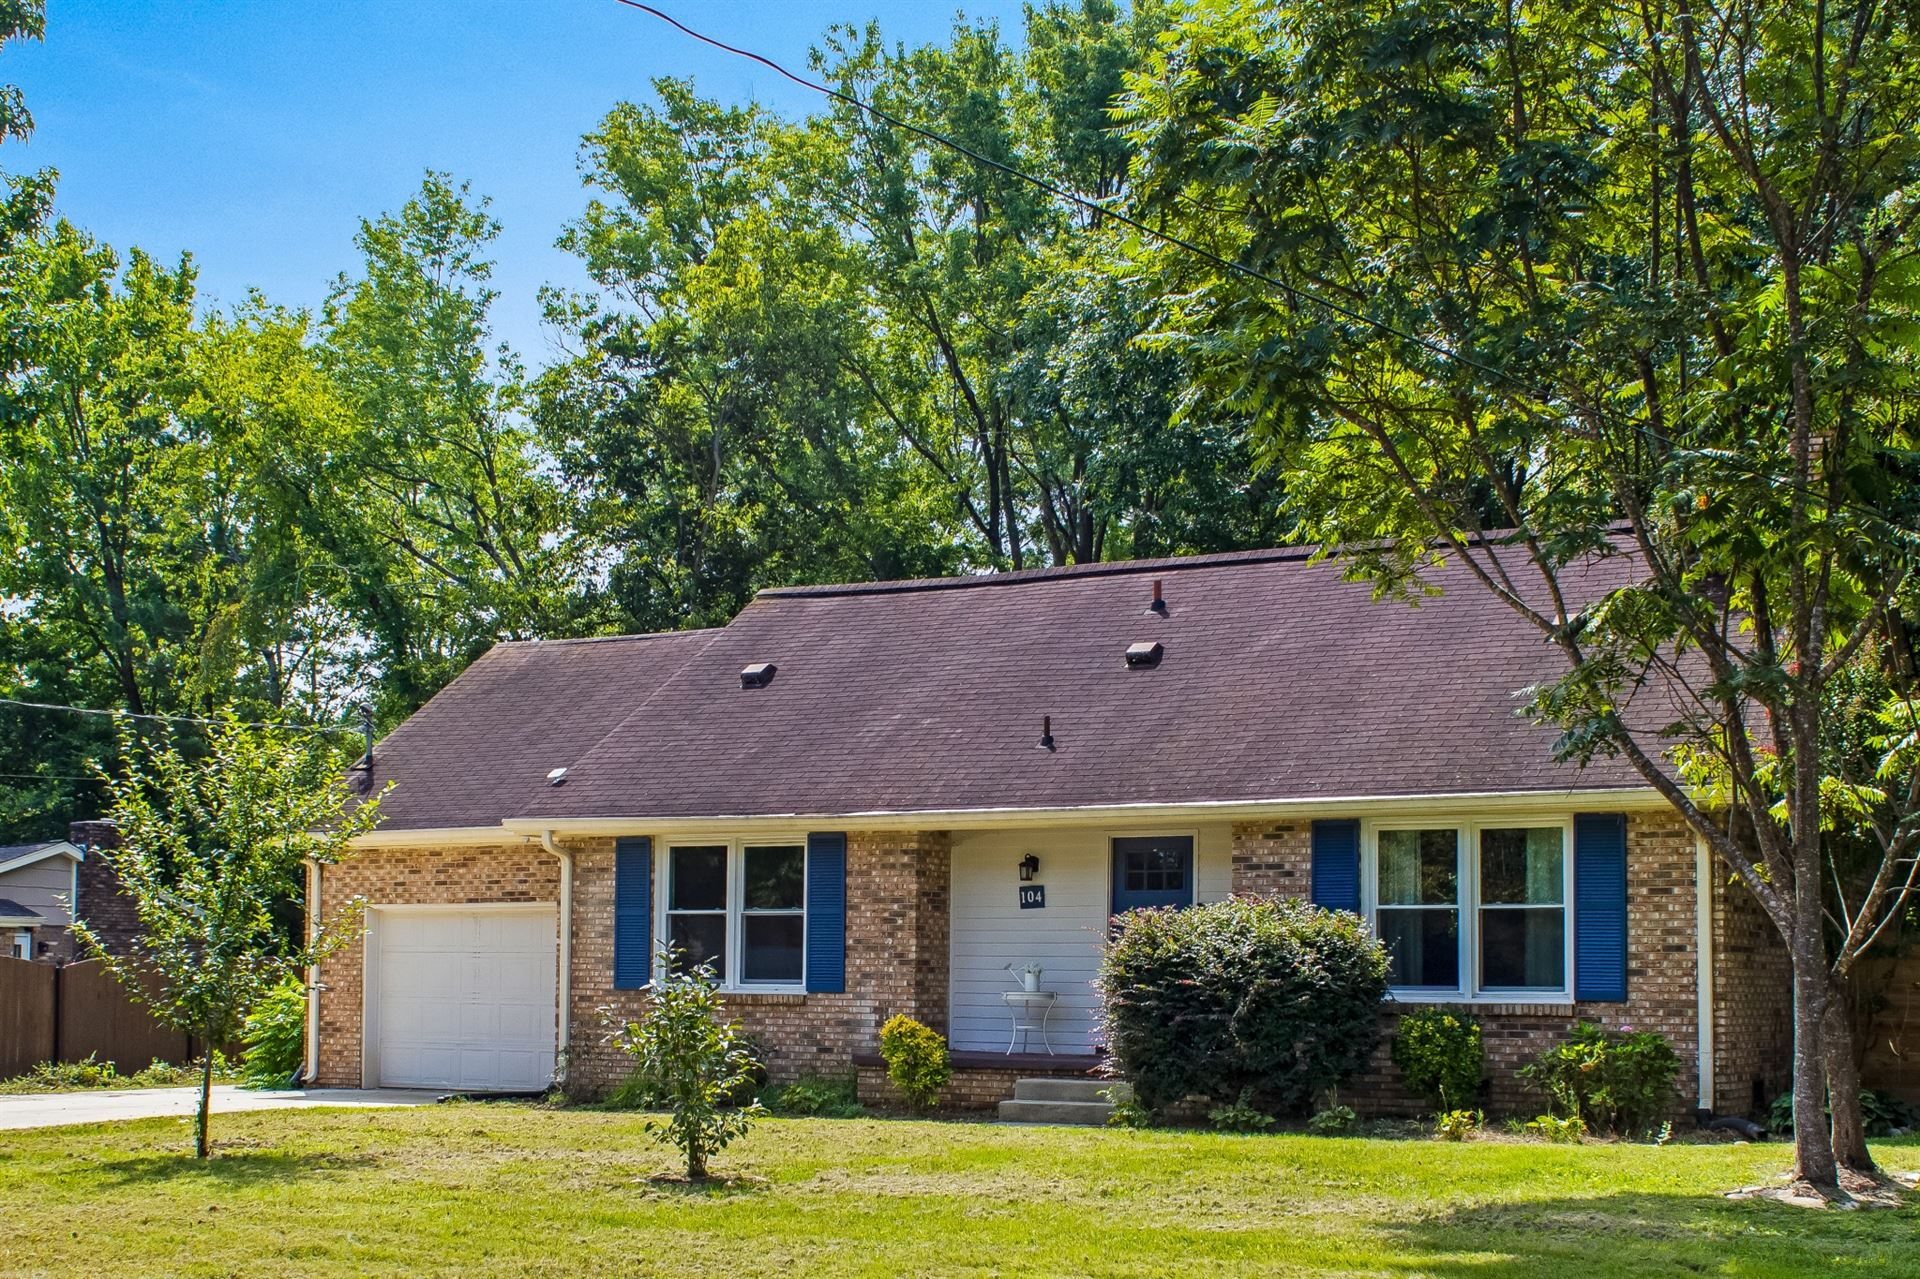 Photo of 104 Patrick Ave, Franklin, TN 37064 (MLS # 2289540)